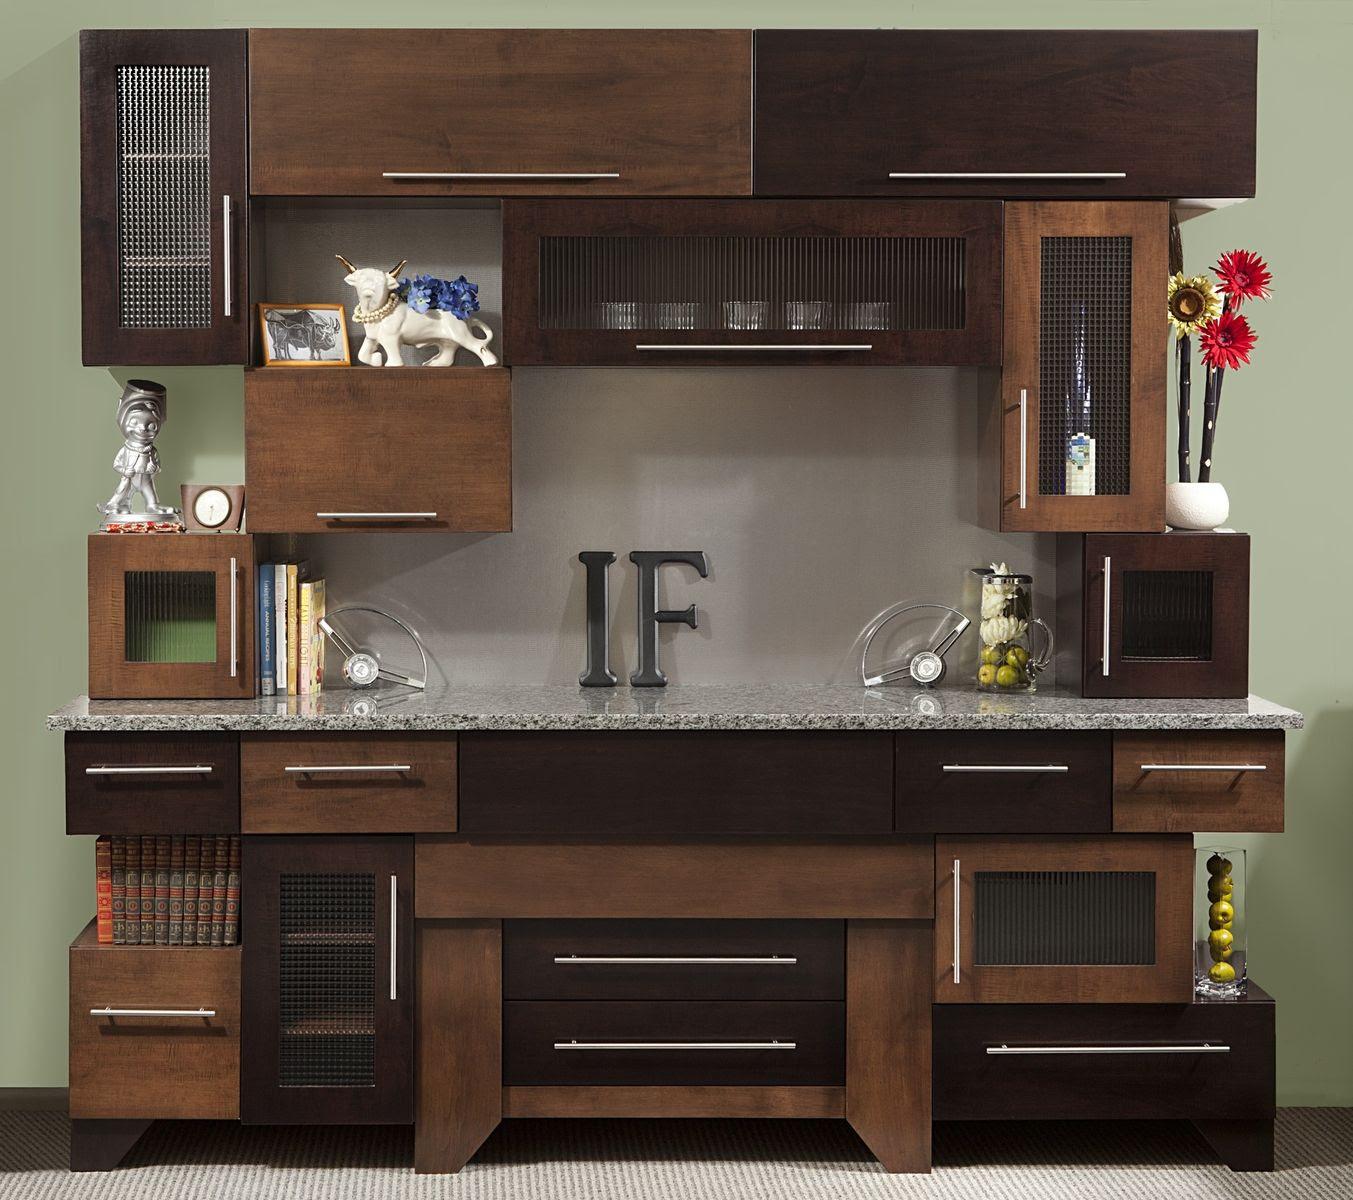 Cubist Cabinets Kitchen Modern Clean In Tiger Maple & Glass - Expresso